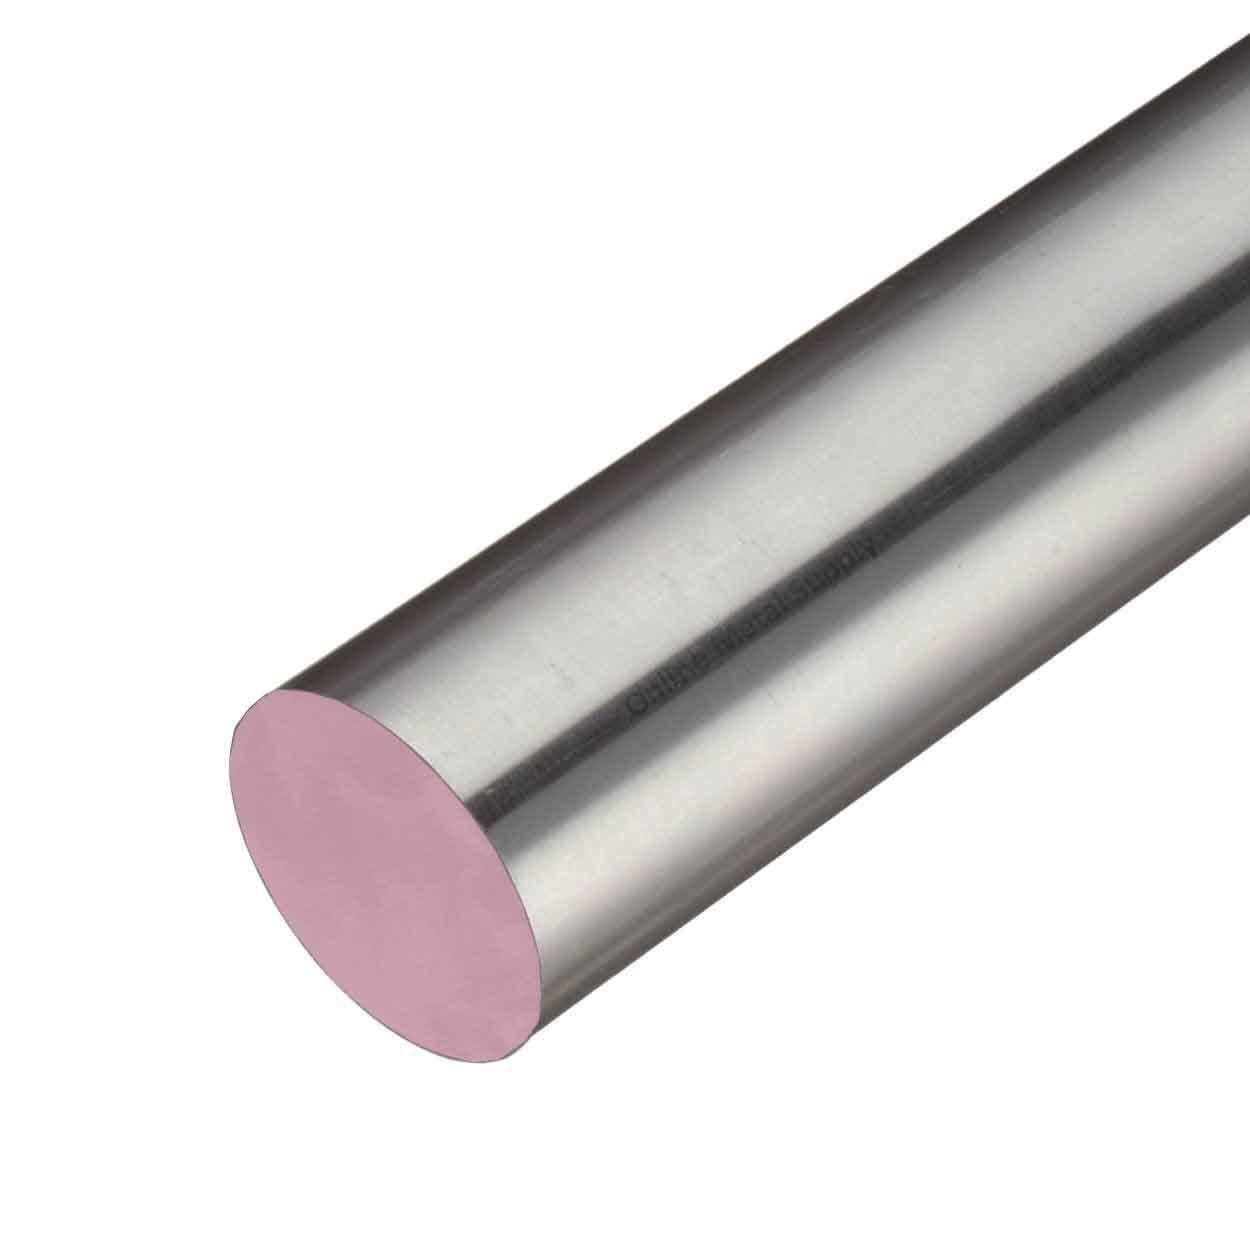 Online Award Metal Supply 303 Stainless 2.000 Round inch mart Steel Rod